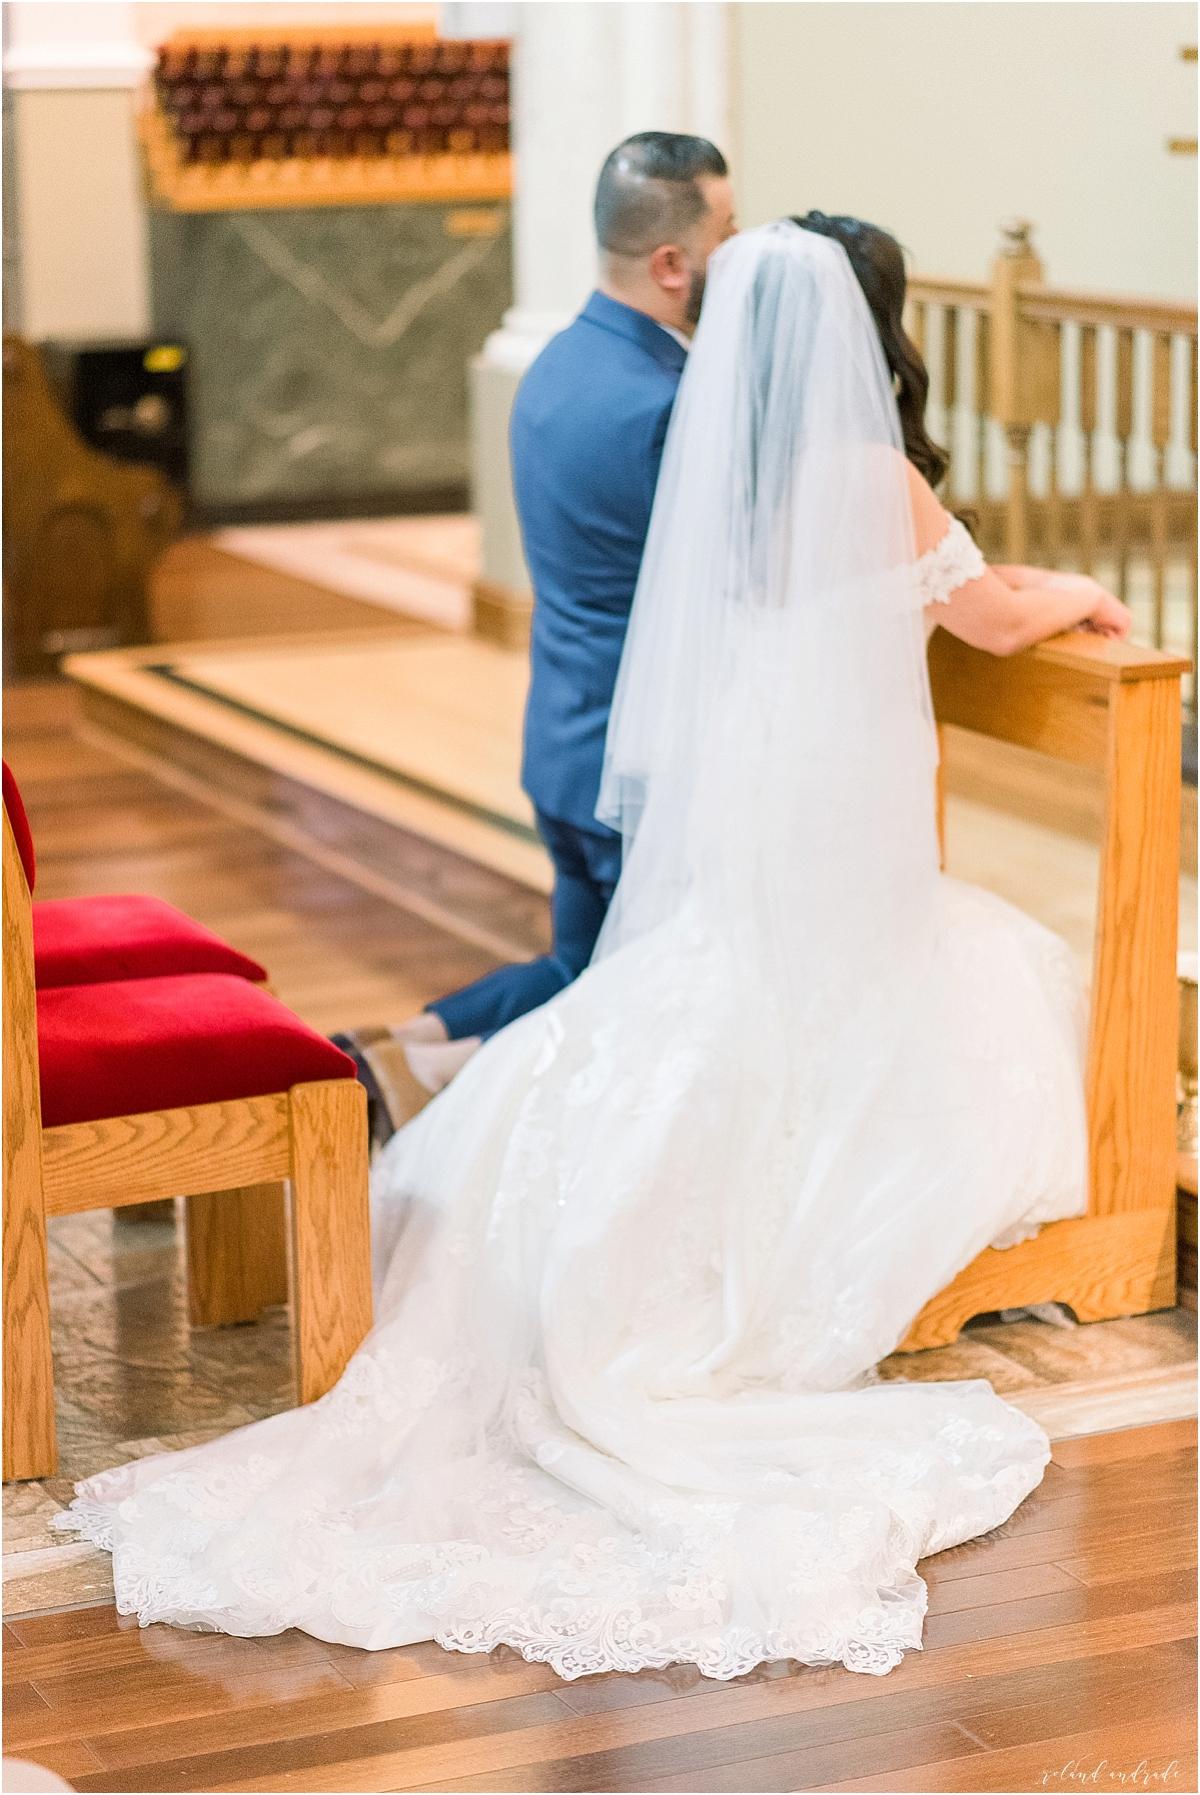 Rancho Los Guzman Wedding Joliet, Joliet Wedding, Joliet Wedding Photographer, Chicago Wedding Photographer, Best Photographer In Joliet, Best Photographer In Chicago, Light And Airy Photographer Chicago_0032.jpg